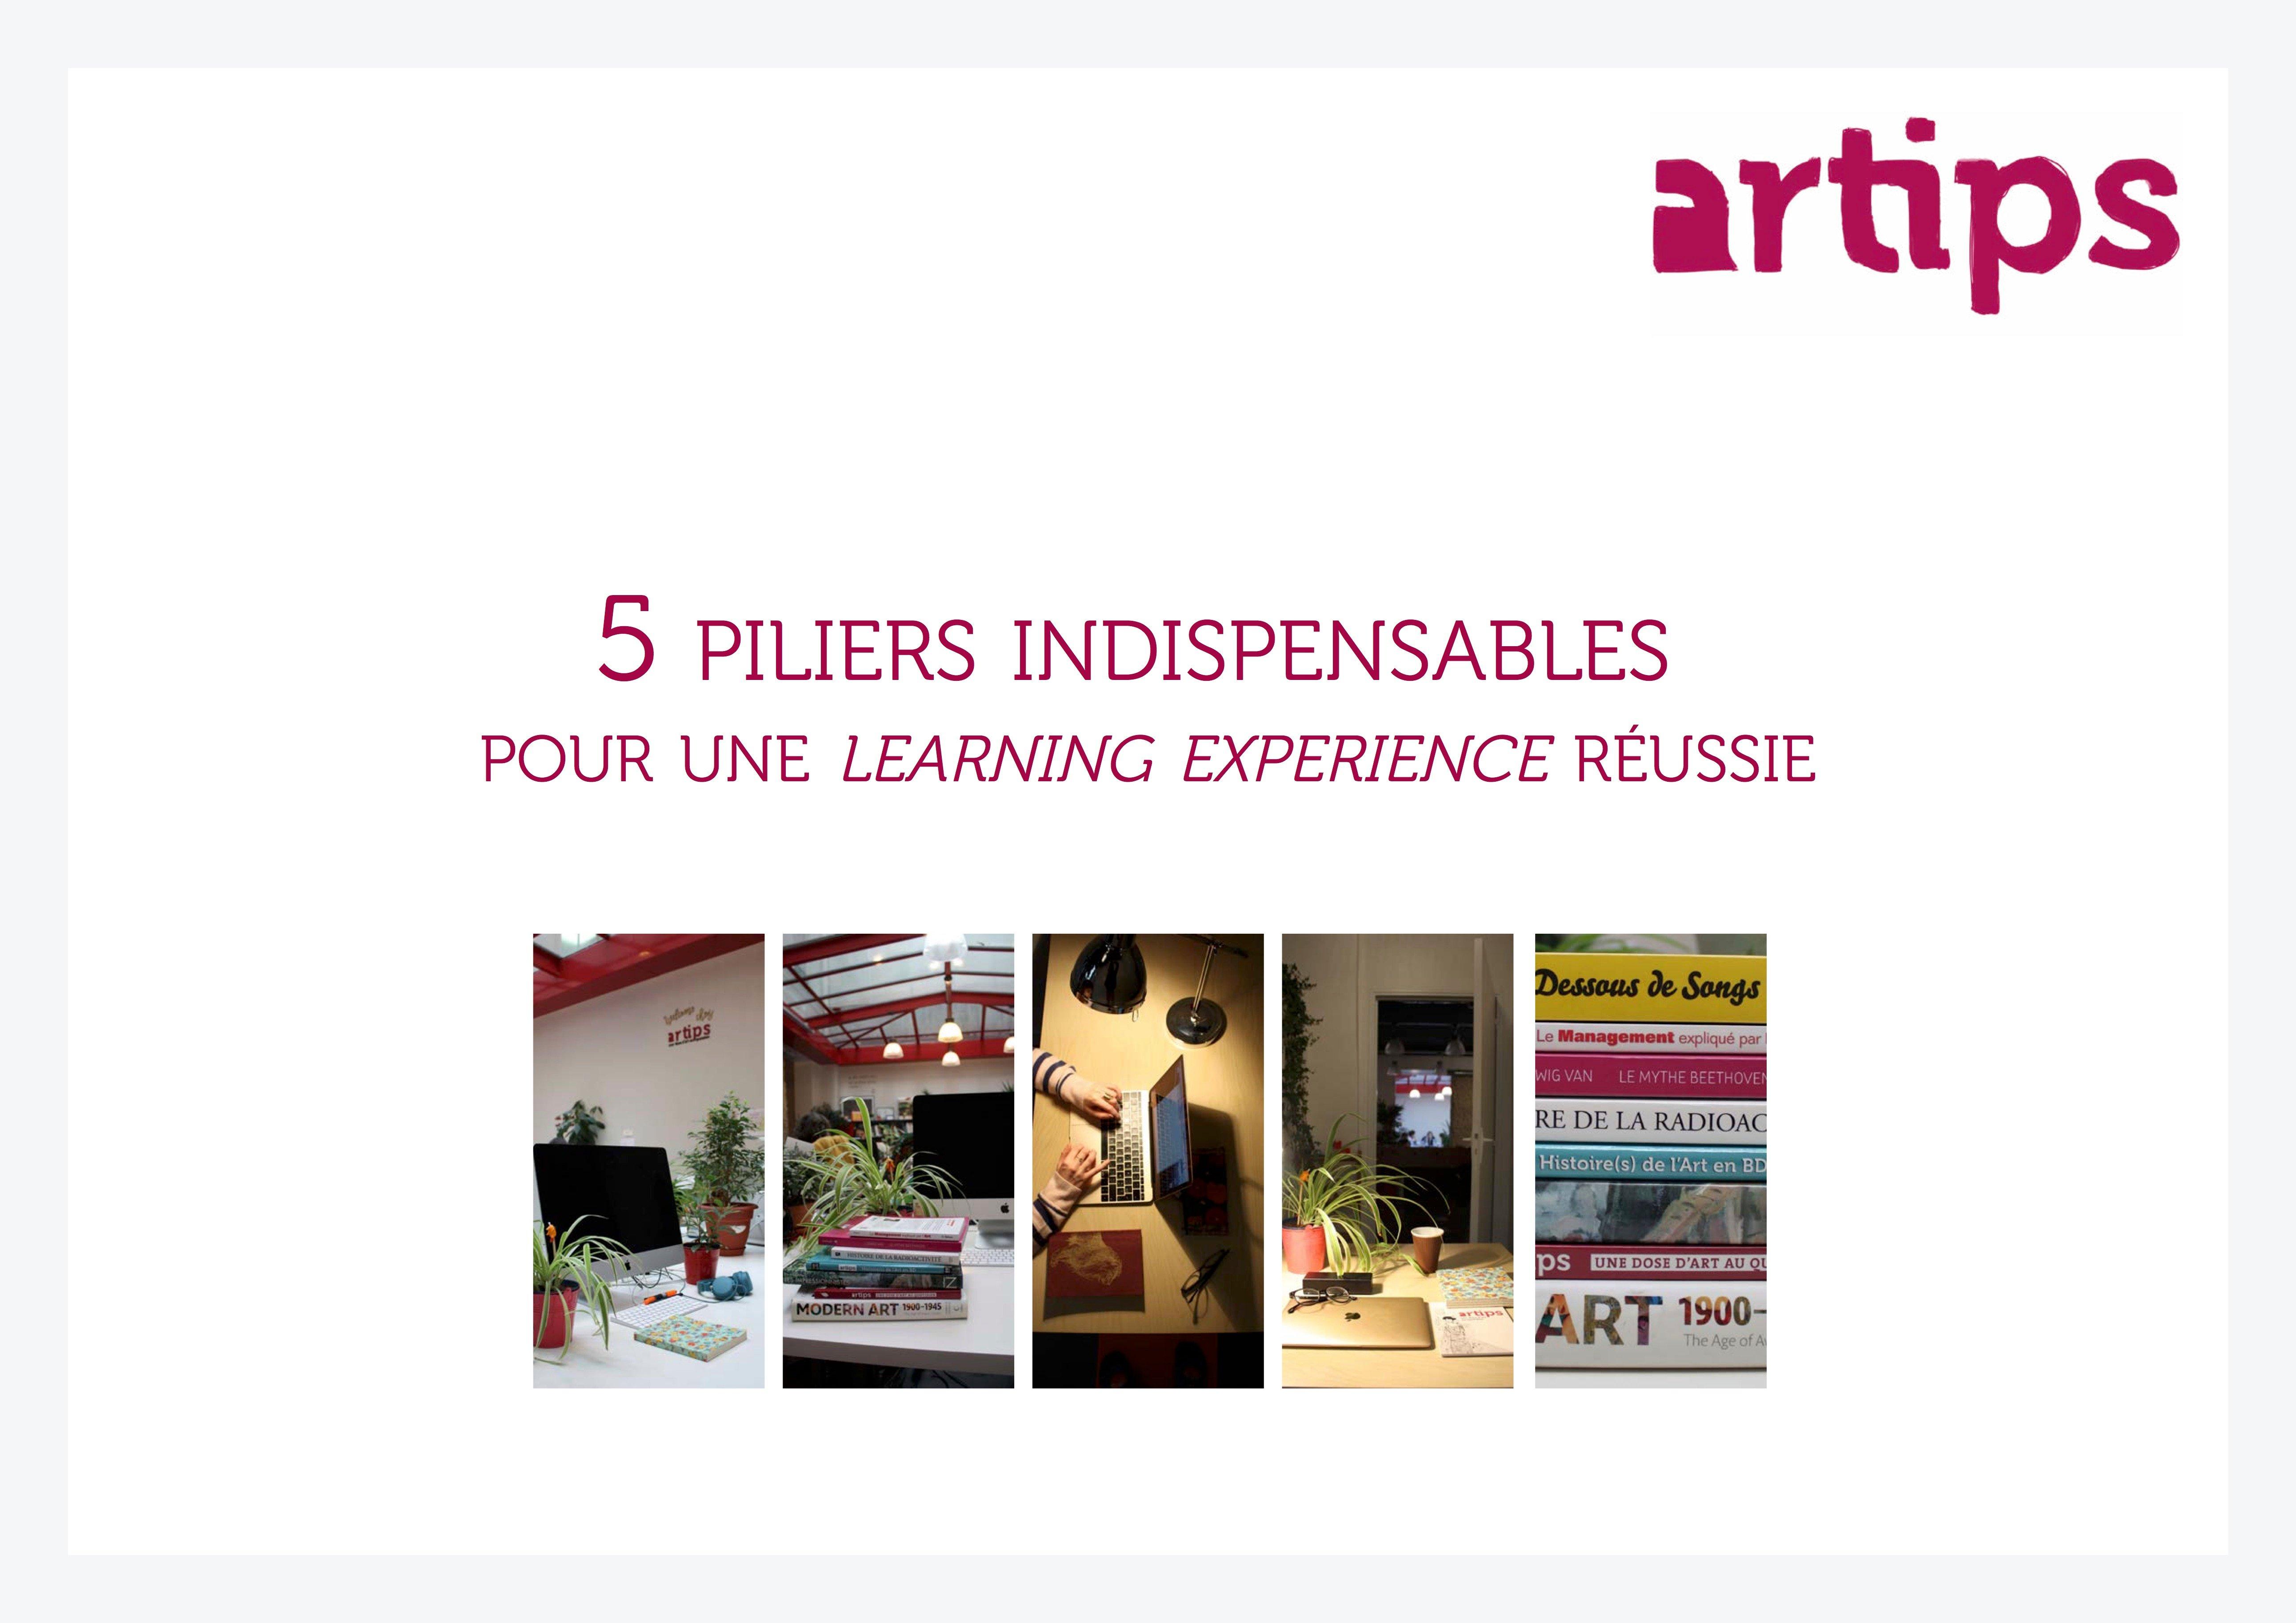 5 piliers indispensables pour une learning experience réussie